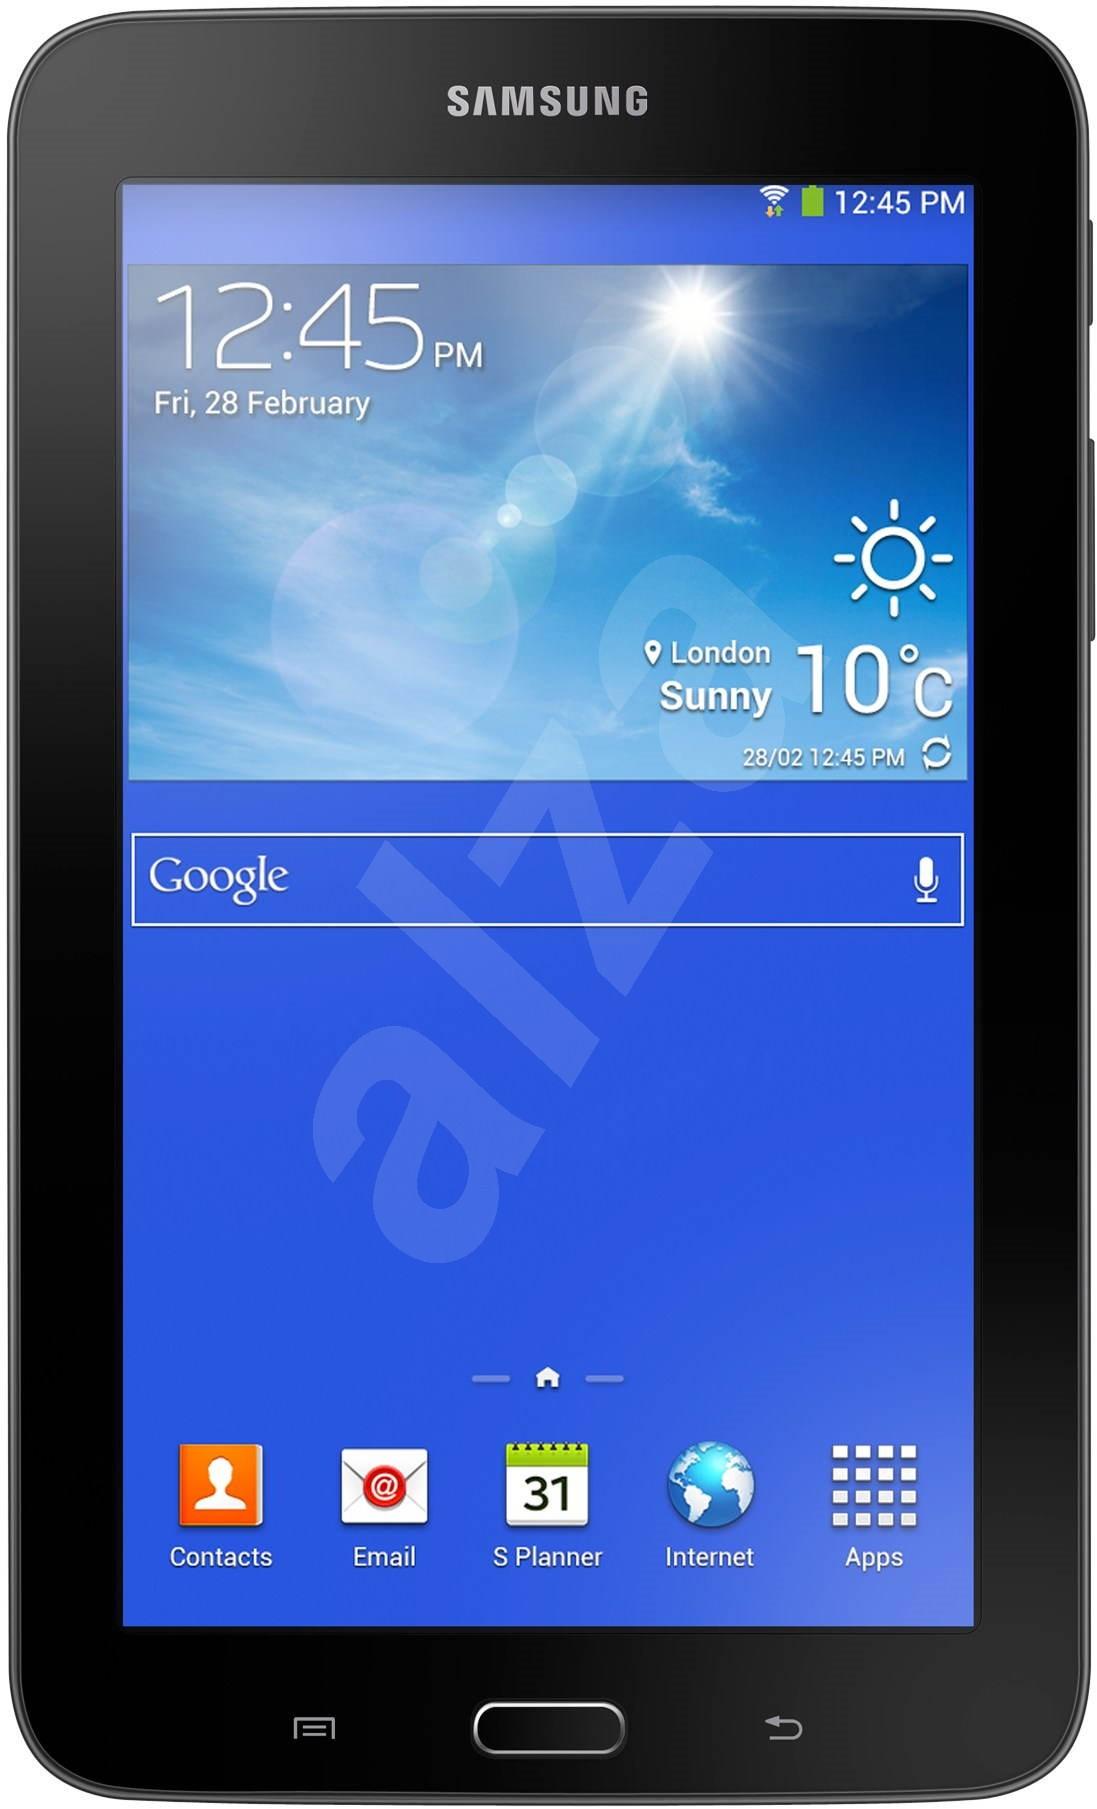 Samsung galaxy tab 3 7 0 lite wi fi black 8gb sm t110 - Samsung galaxy tab 3 lite sm t110 price ...